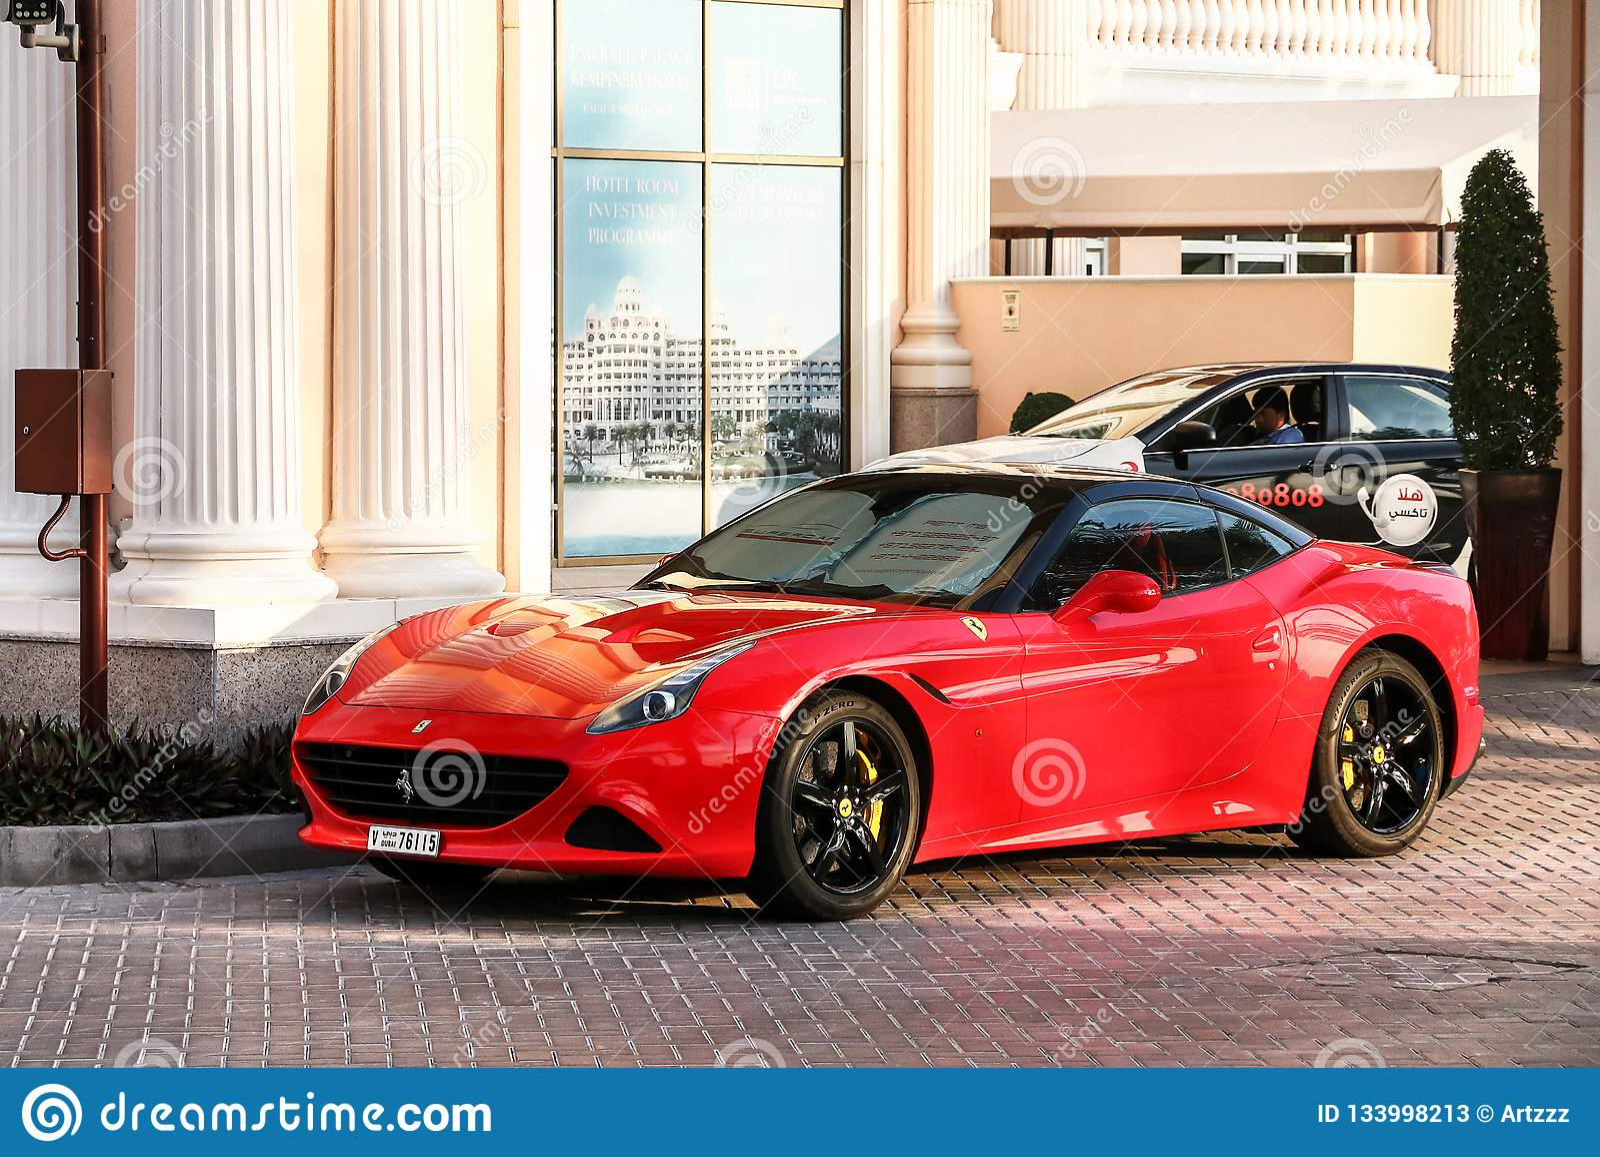 Ferrari California T Editorial Stock Photo Image Of Hardtop 133998213